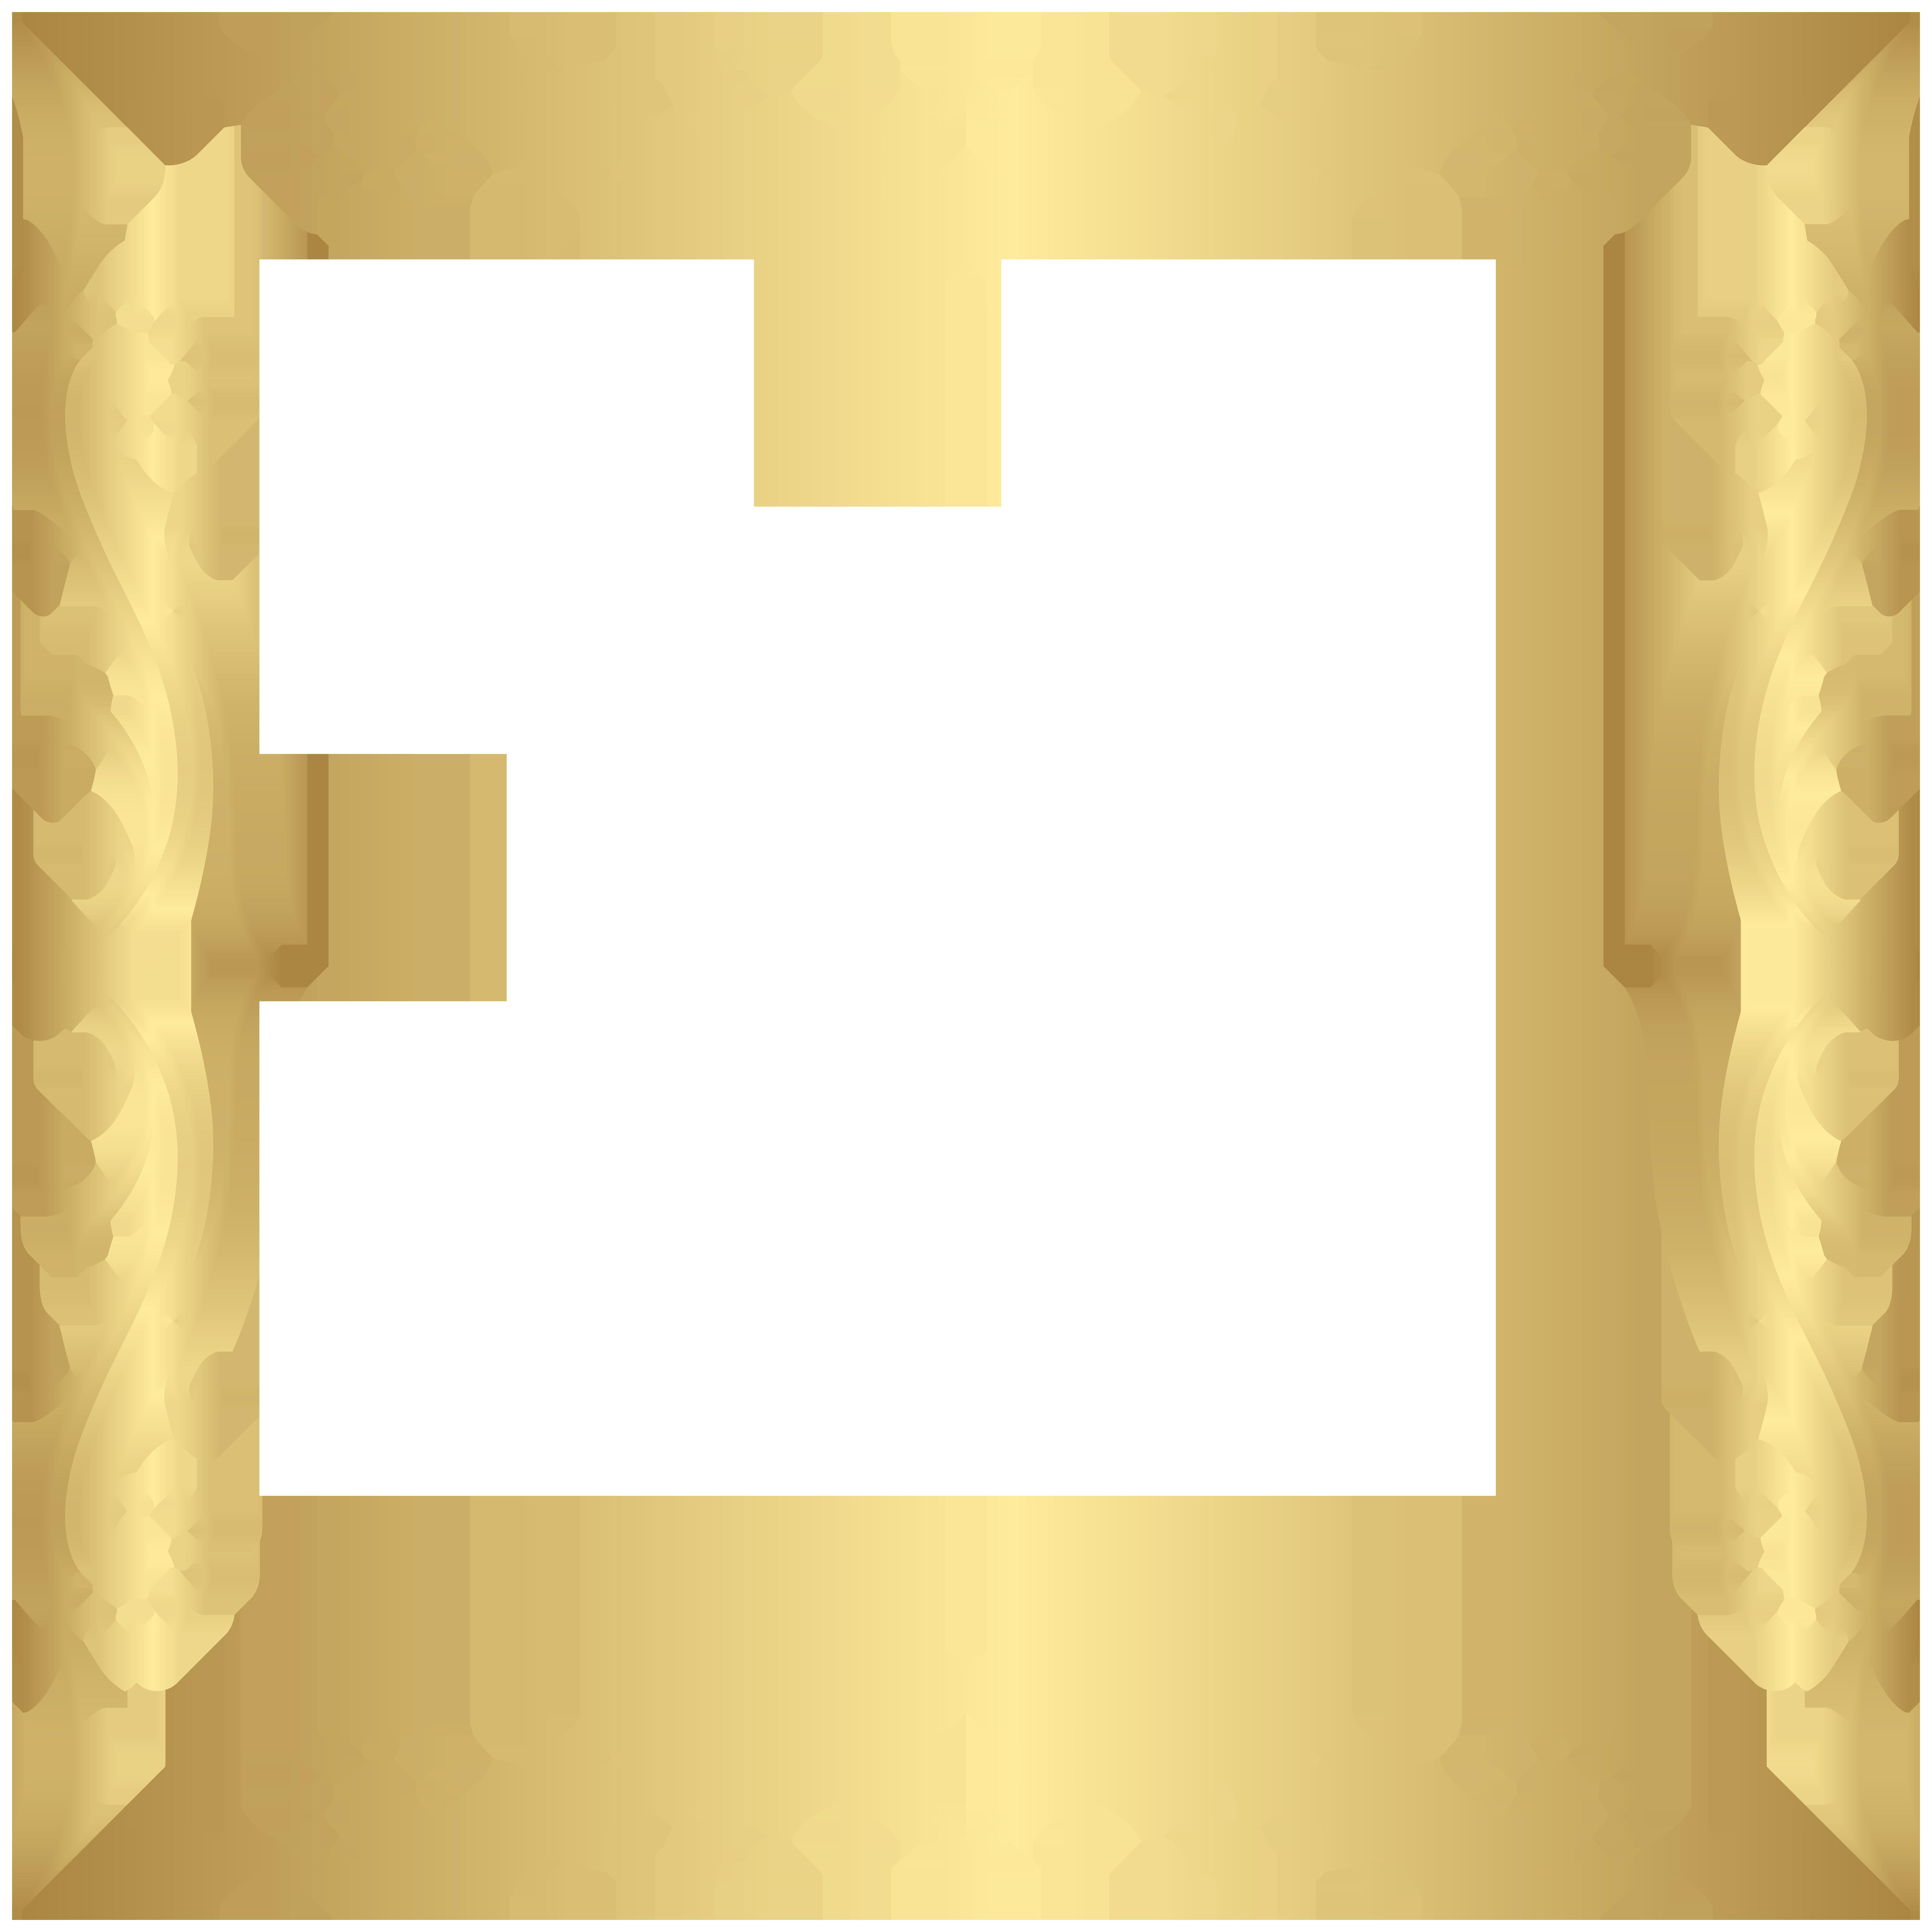 Clipart gallery visual art. Decorative border frame transparent